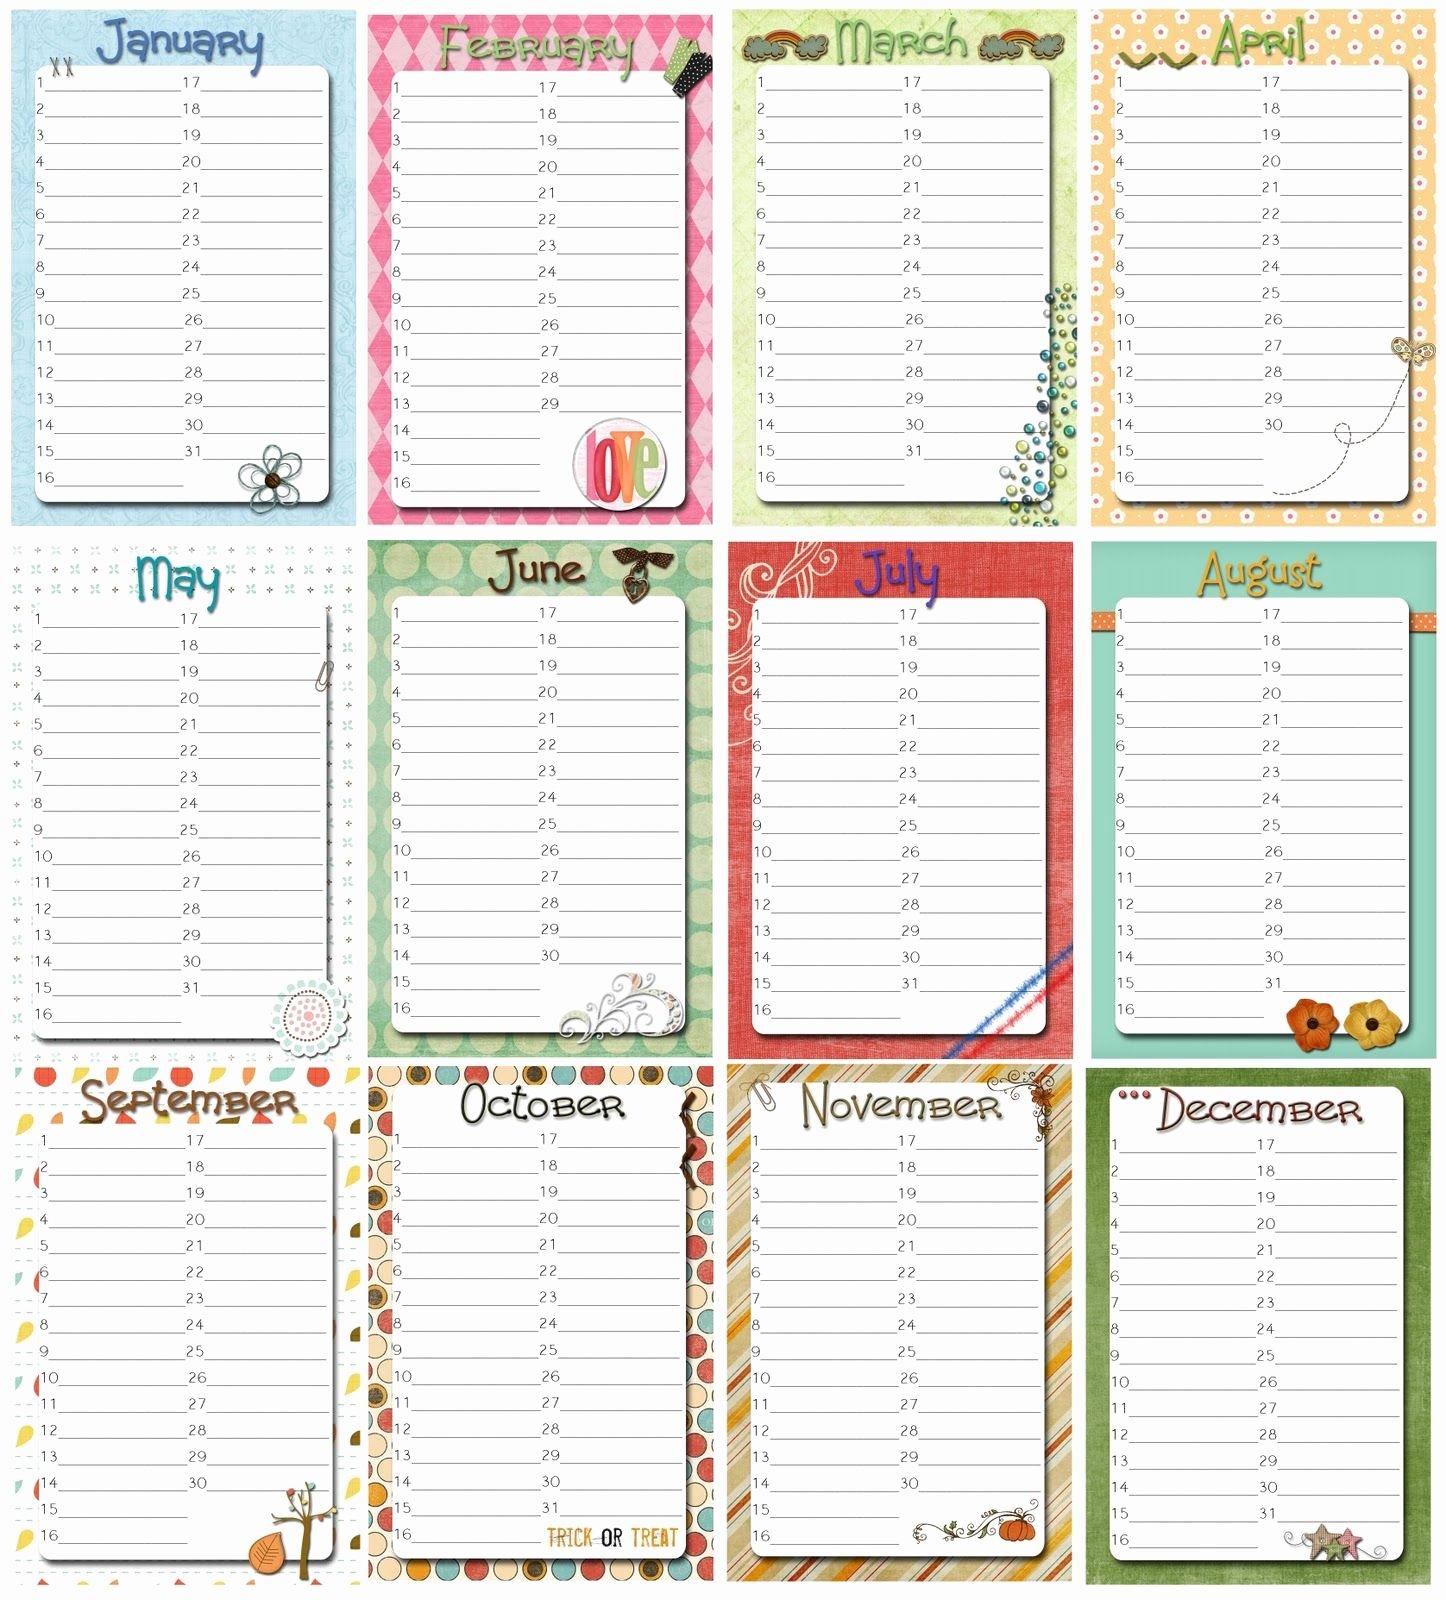 Employee Birthday List Template Inspirational Family Birthday Calendar Printable Free